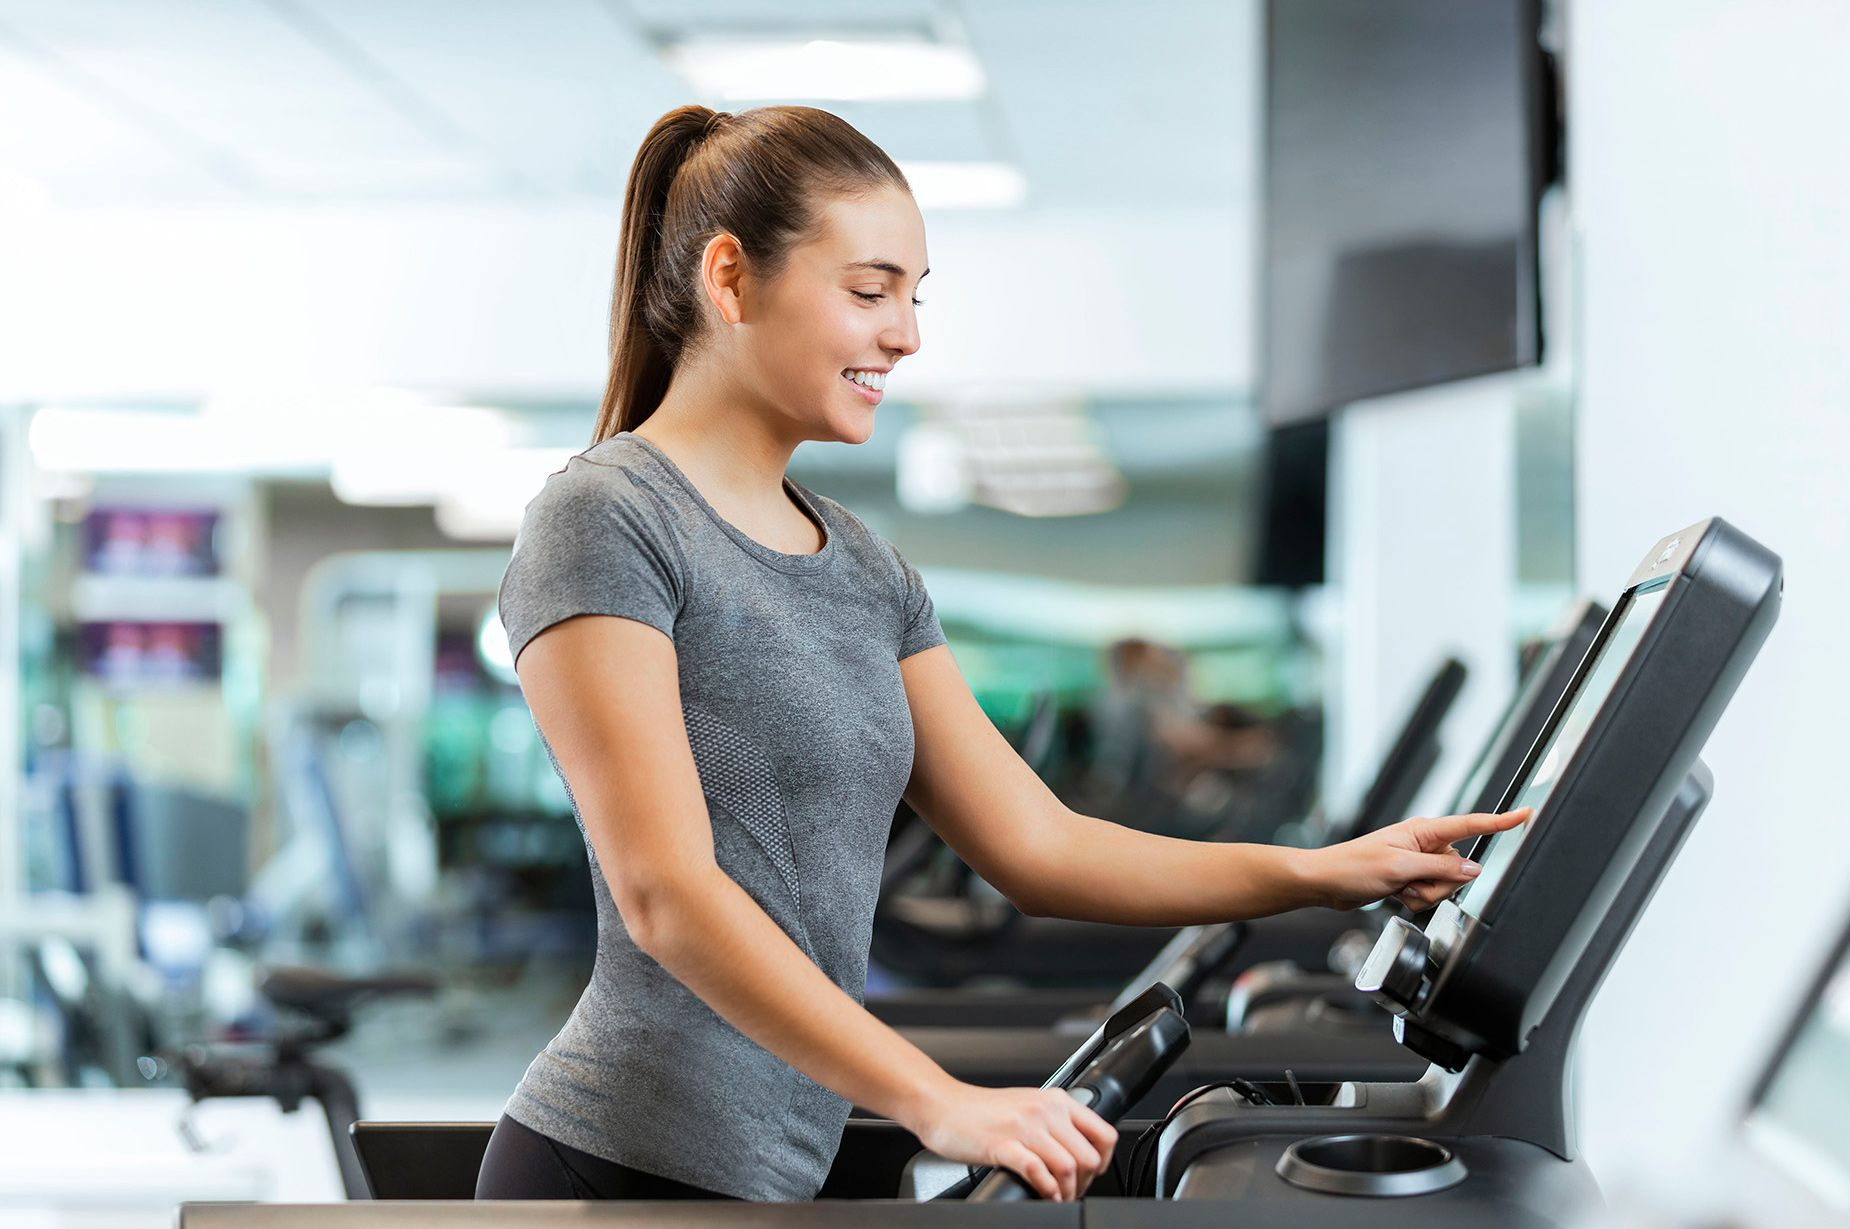 STFCY_1119_Fitness_Center_Trainning.jpg